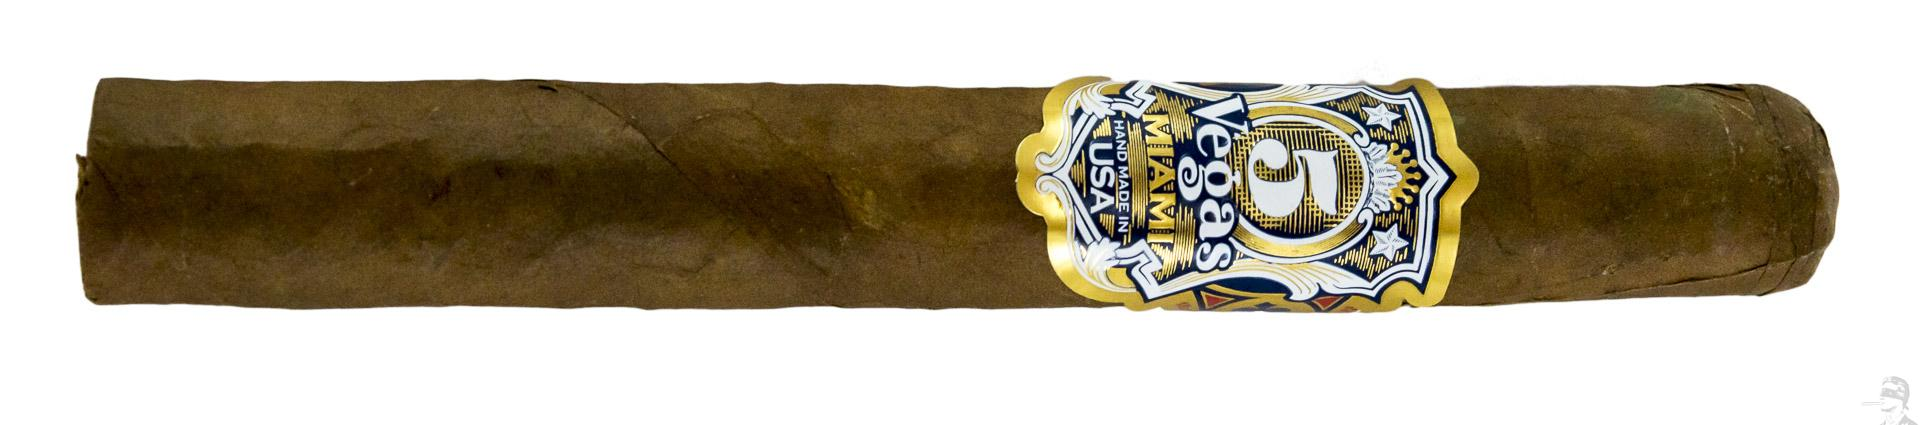 Blind Cigar Review: 5 Vegas | Miami (2014 G.A.R. Version) Toro